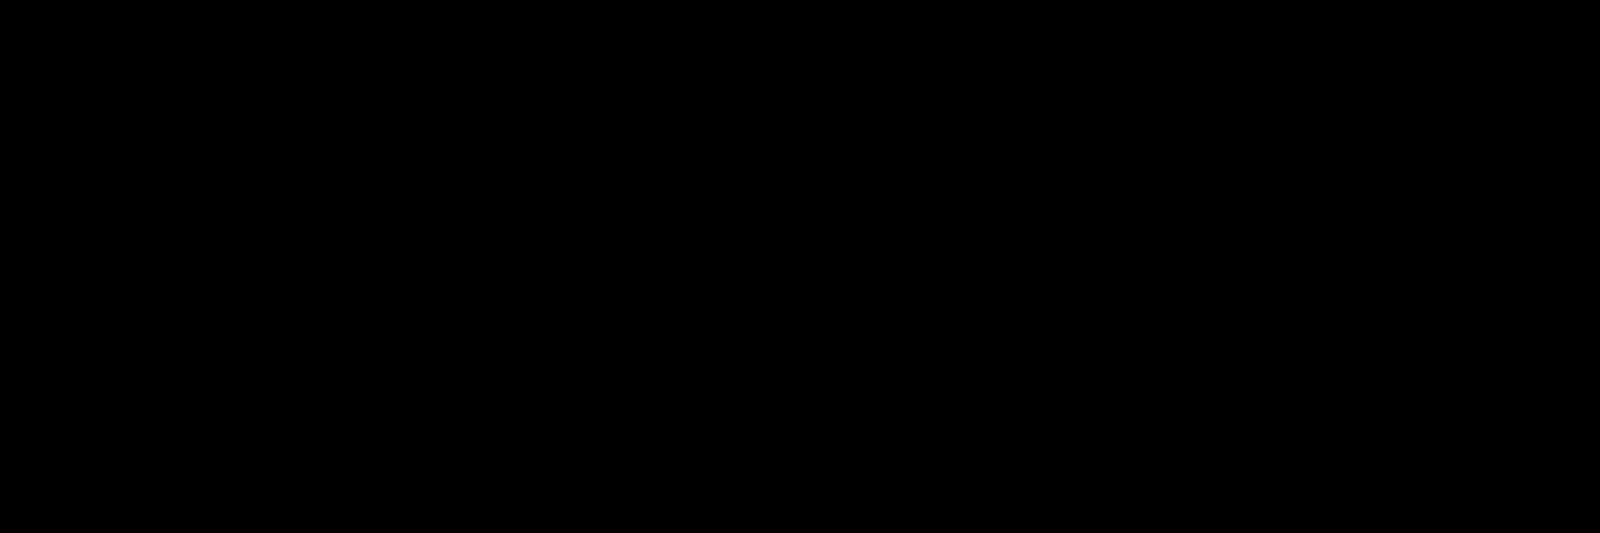 p-Block Elements - Halogens | Chemistry Notes for IITJEE/NEET